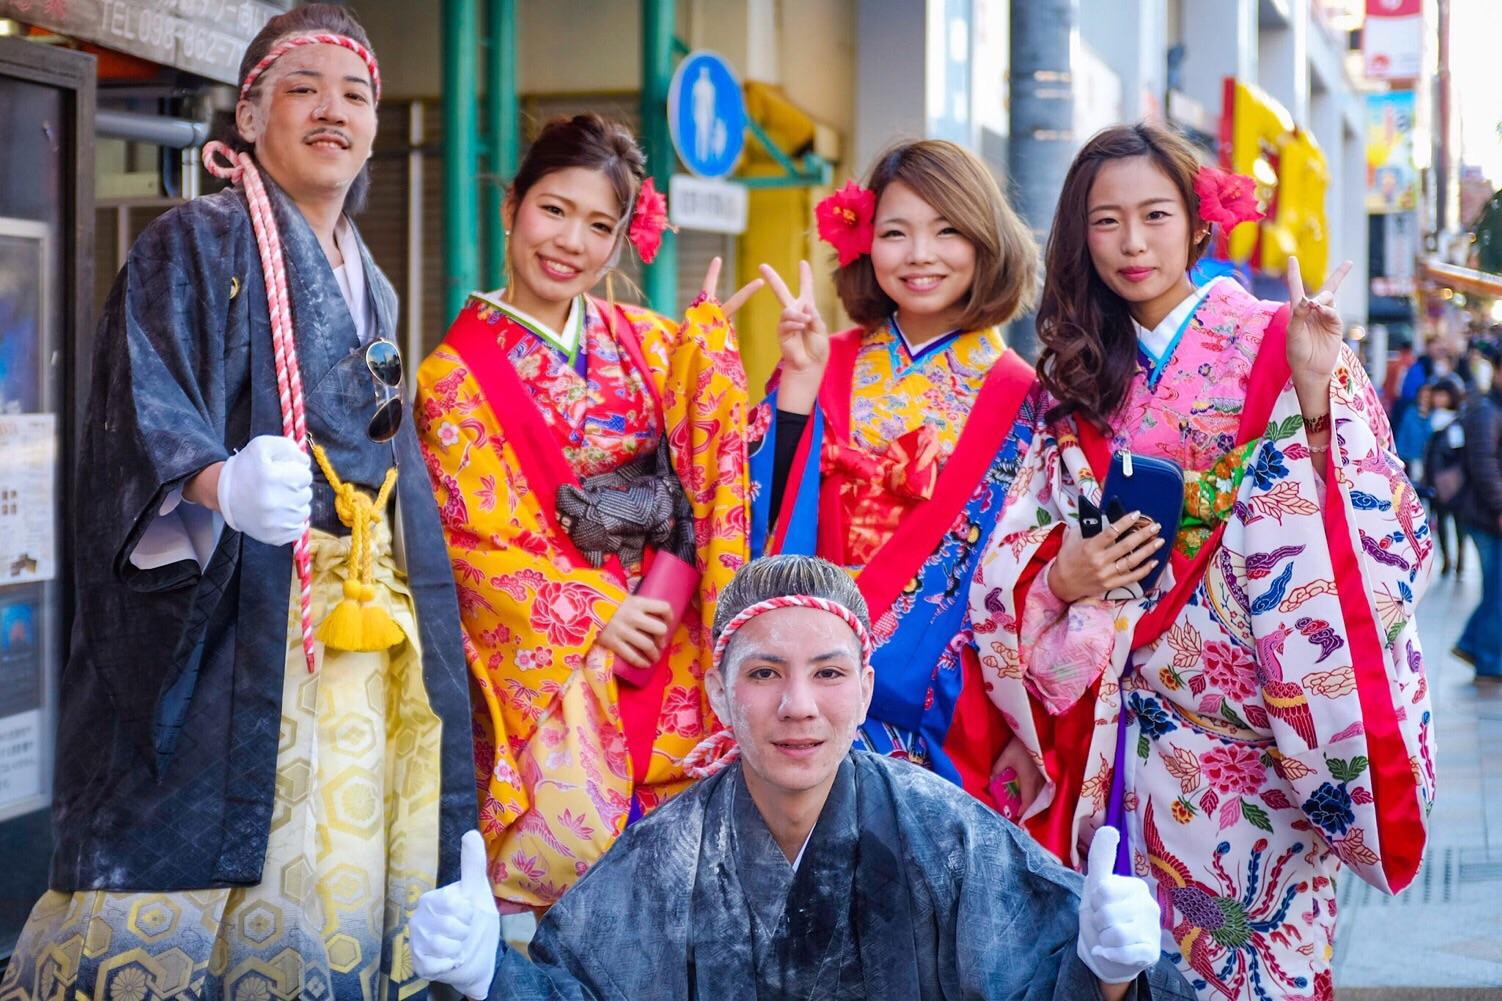 Young people in Naha, Okinawa celebrating Seijin no Hi, Coming of Age Day. Fuji x100s.